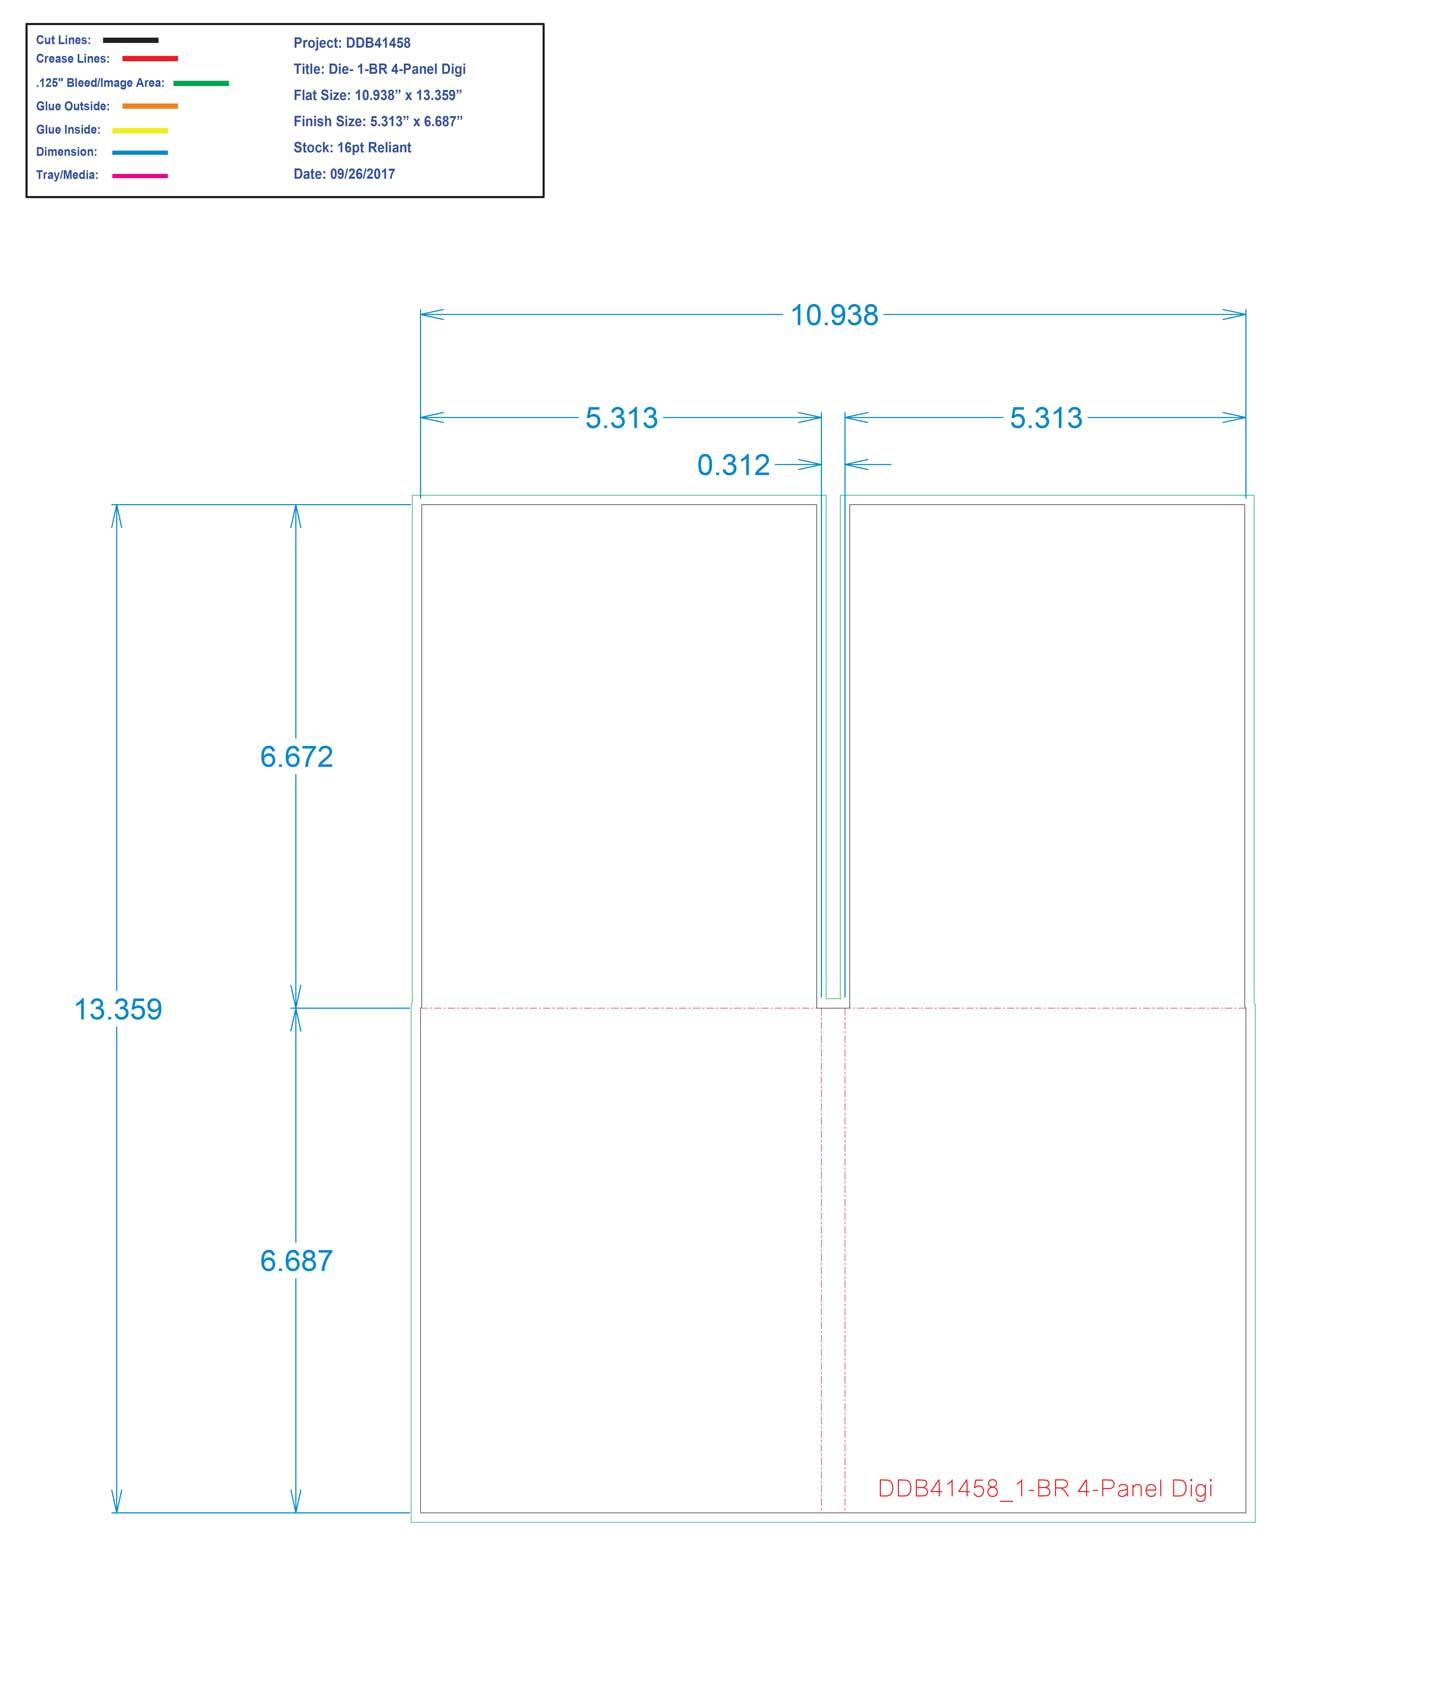 DDB41458 1-BR 4-Panel Digi